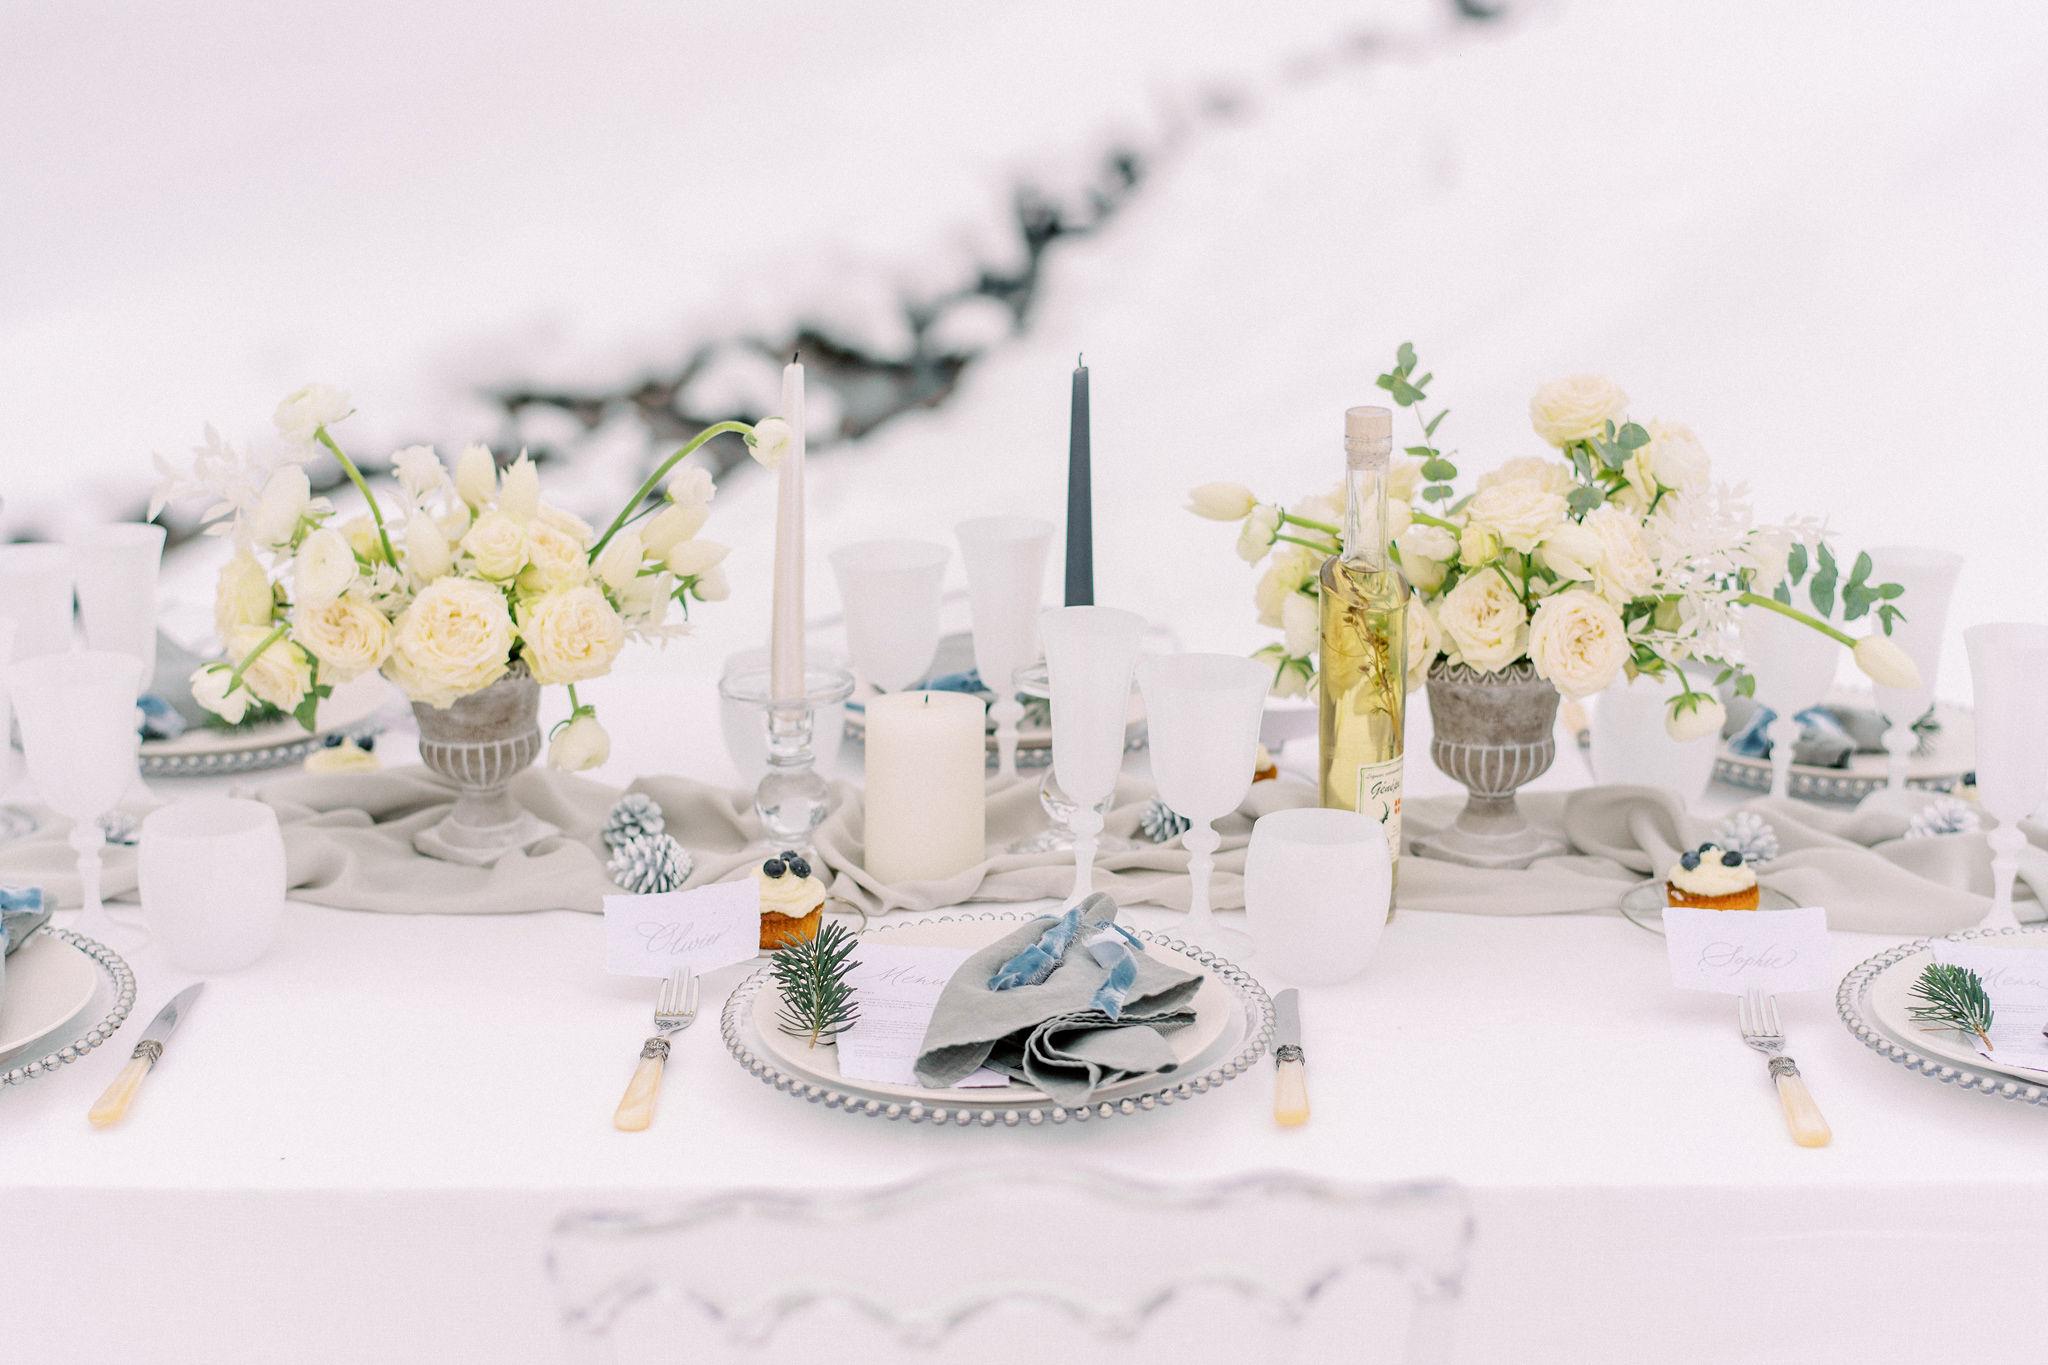 menthe-sauvage-fleuriste-mariage-hiver-neige-provence-lyon-beaujolais-bourgogne-haute-savoie